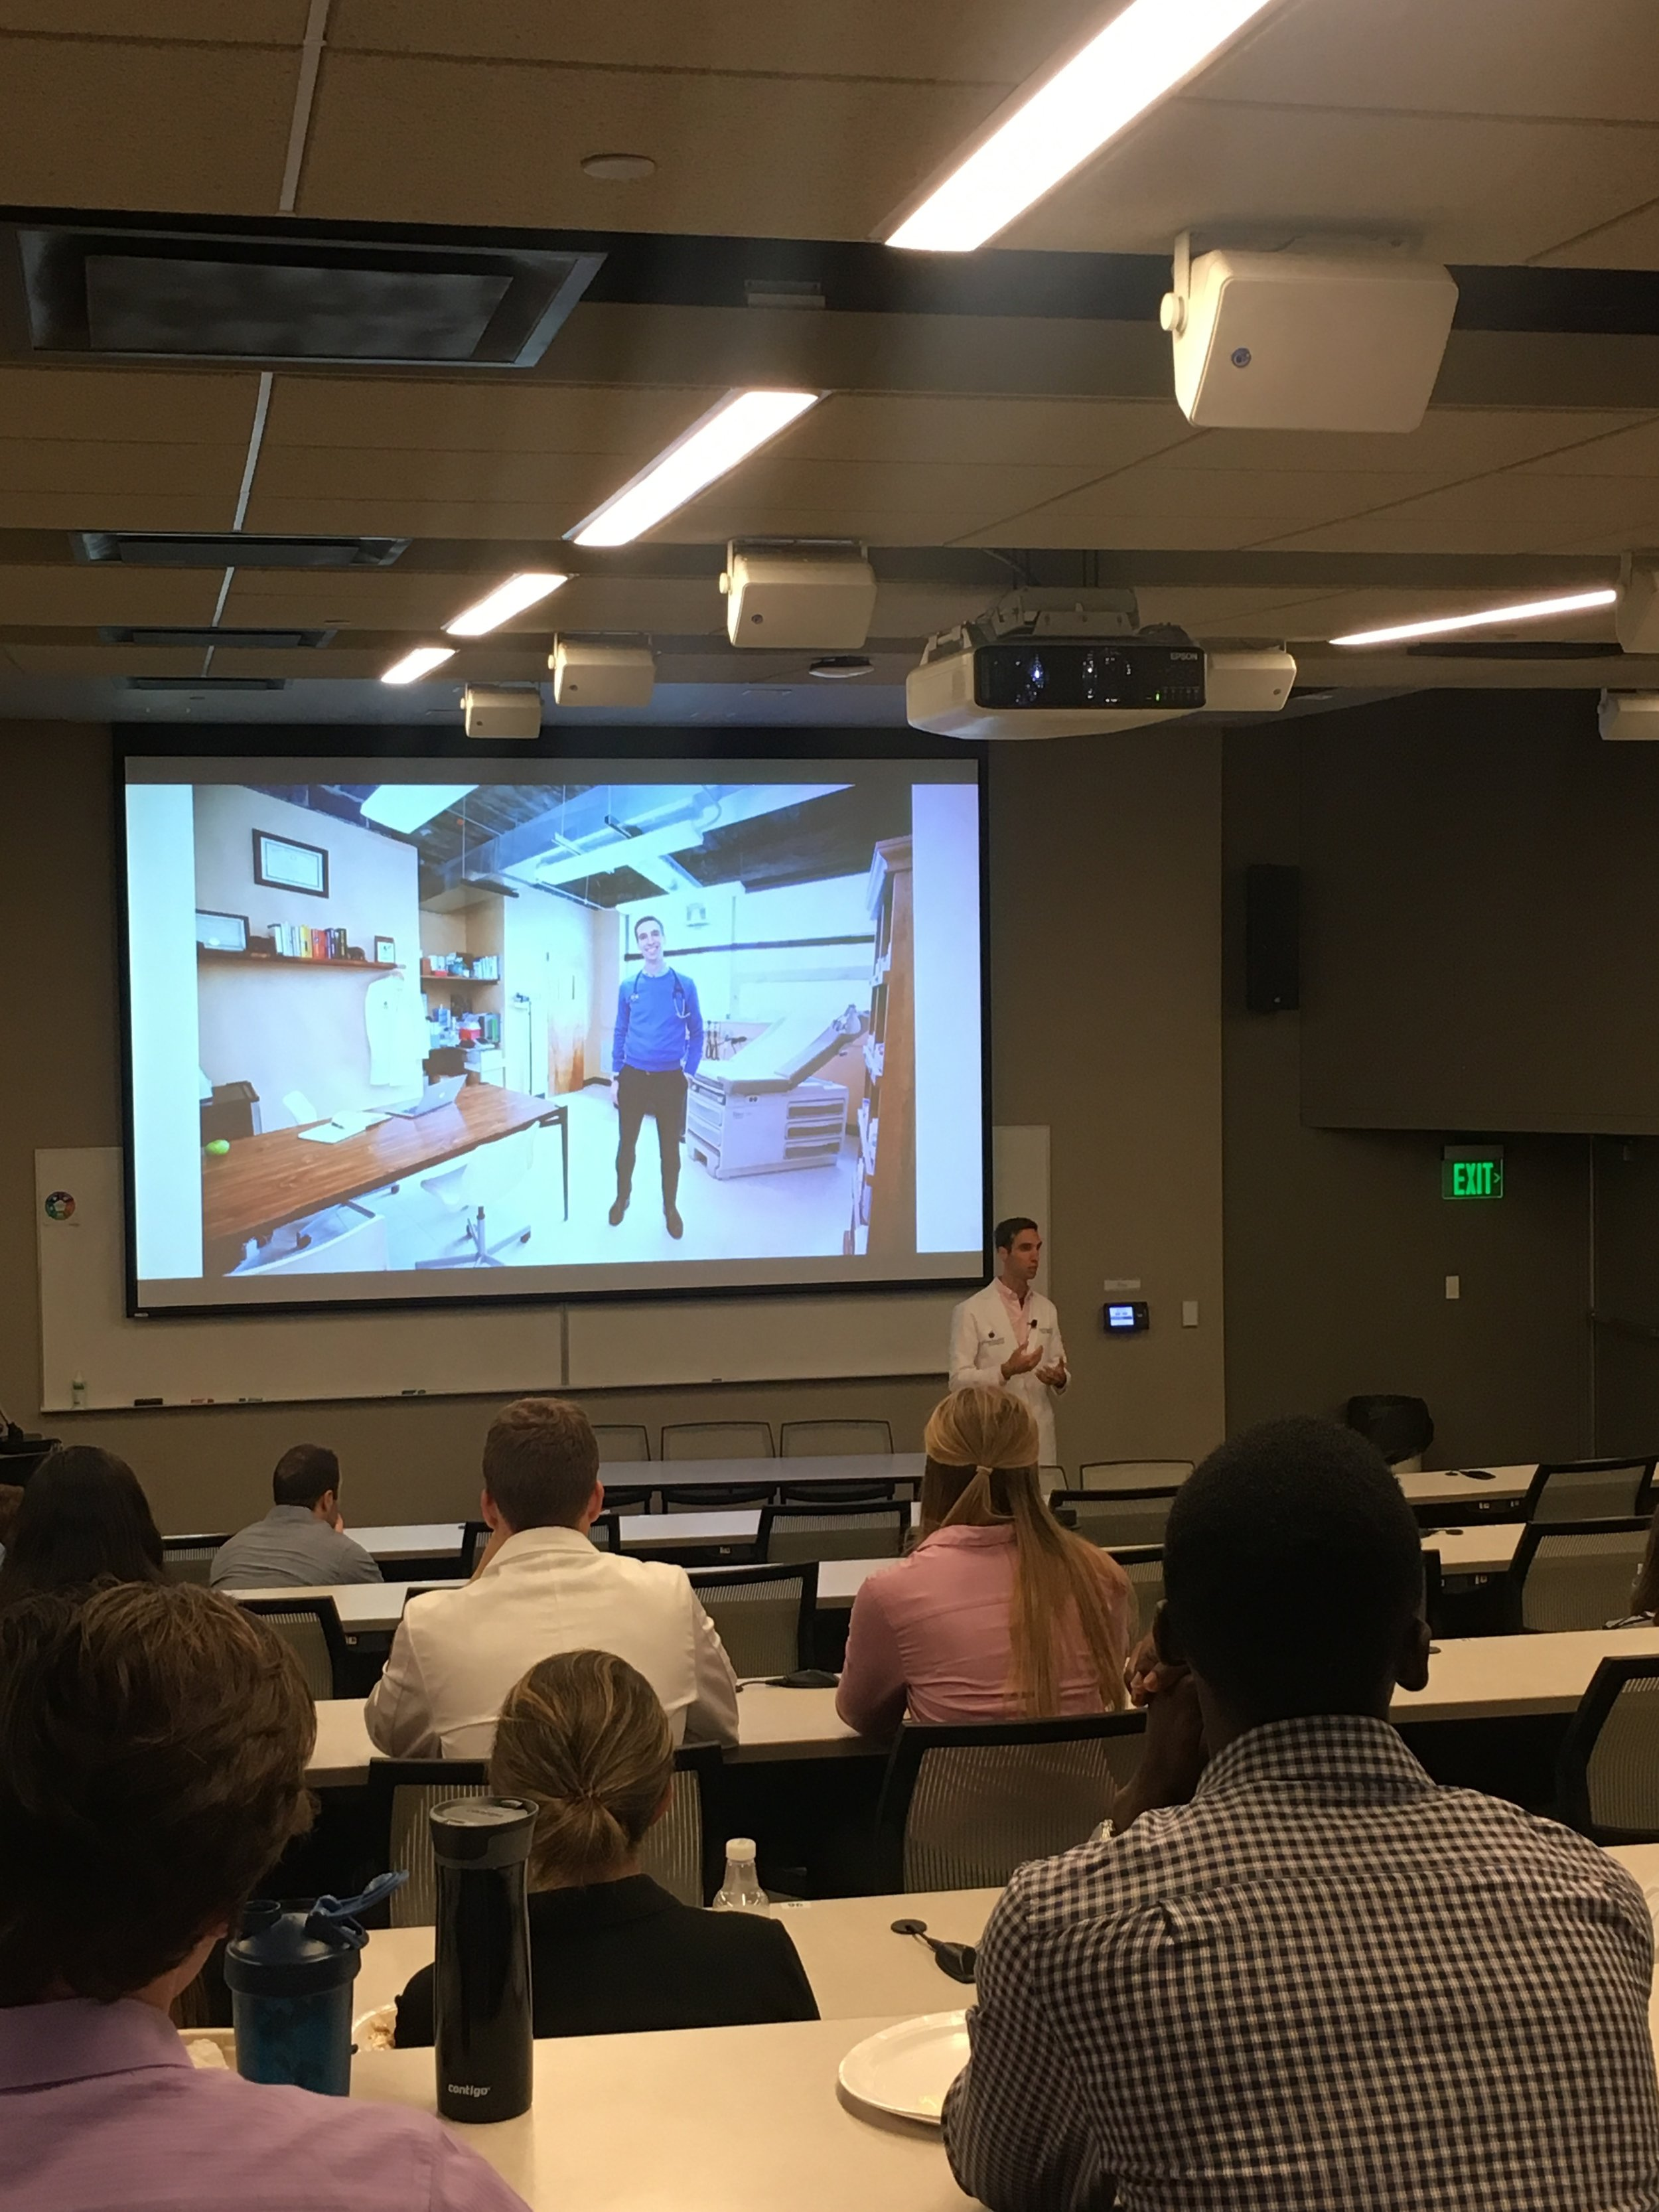 2018.09.24 Plum Health DPC at Oakland University William Beaumont School of Medicine 15.JPG